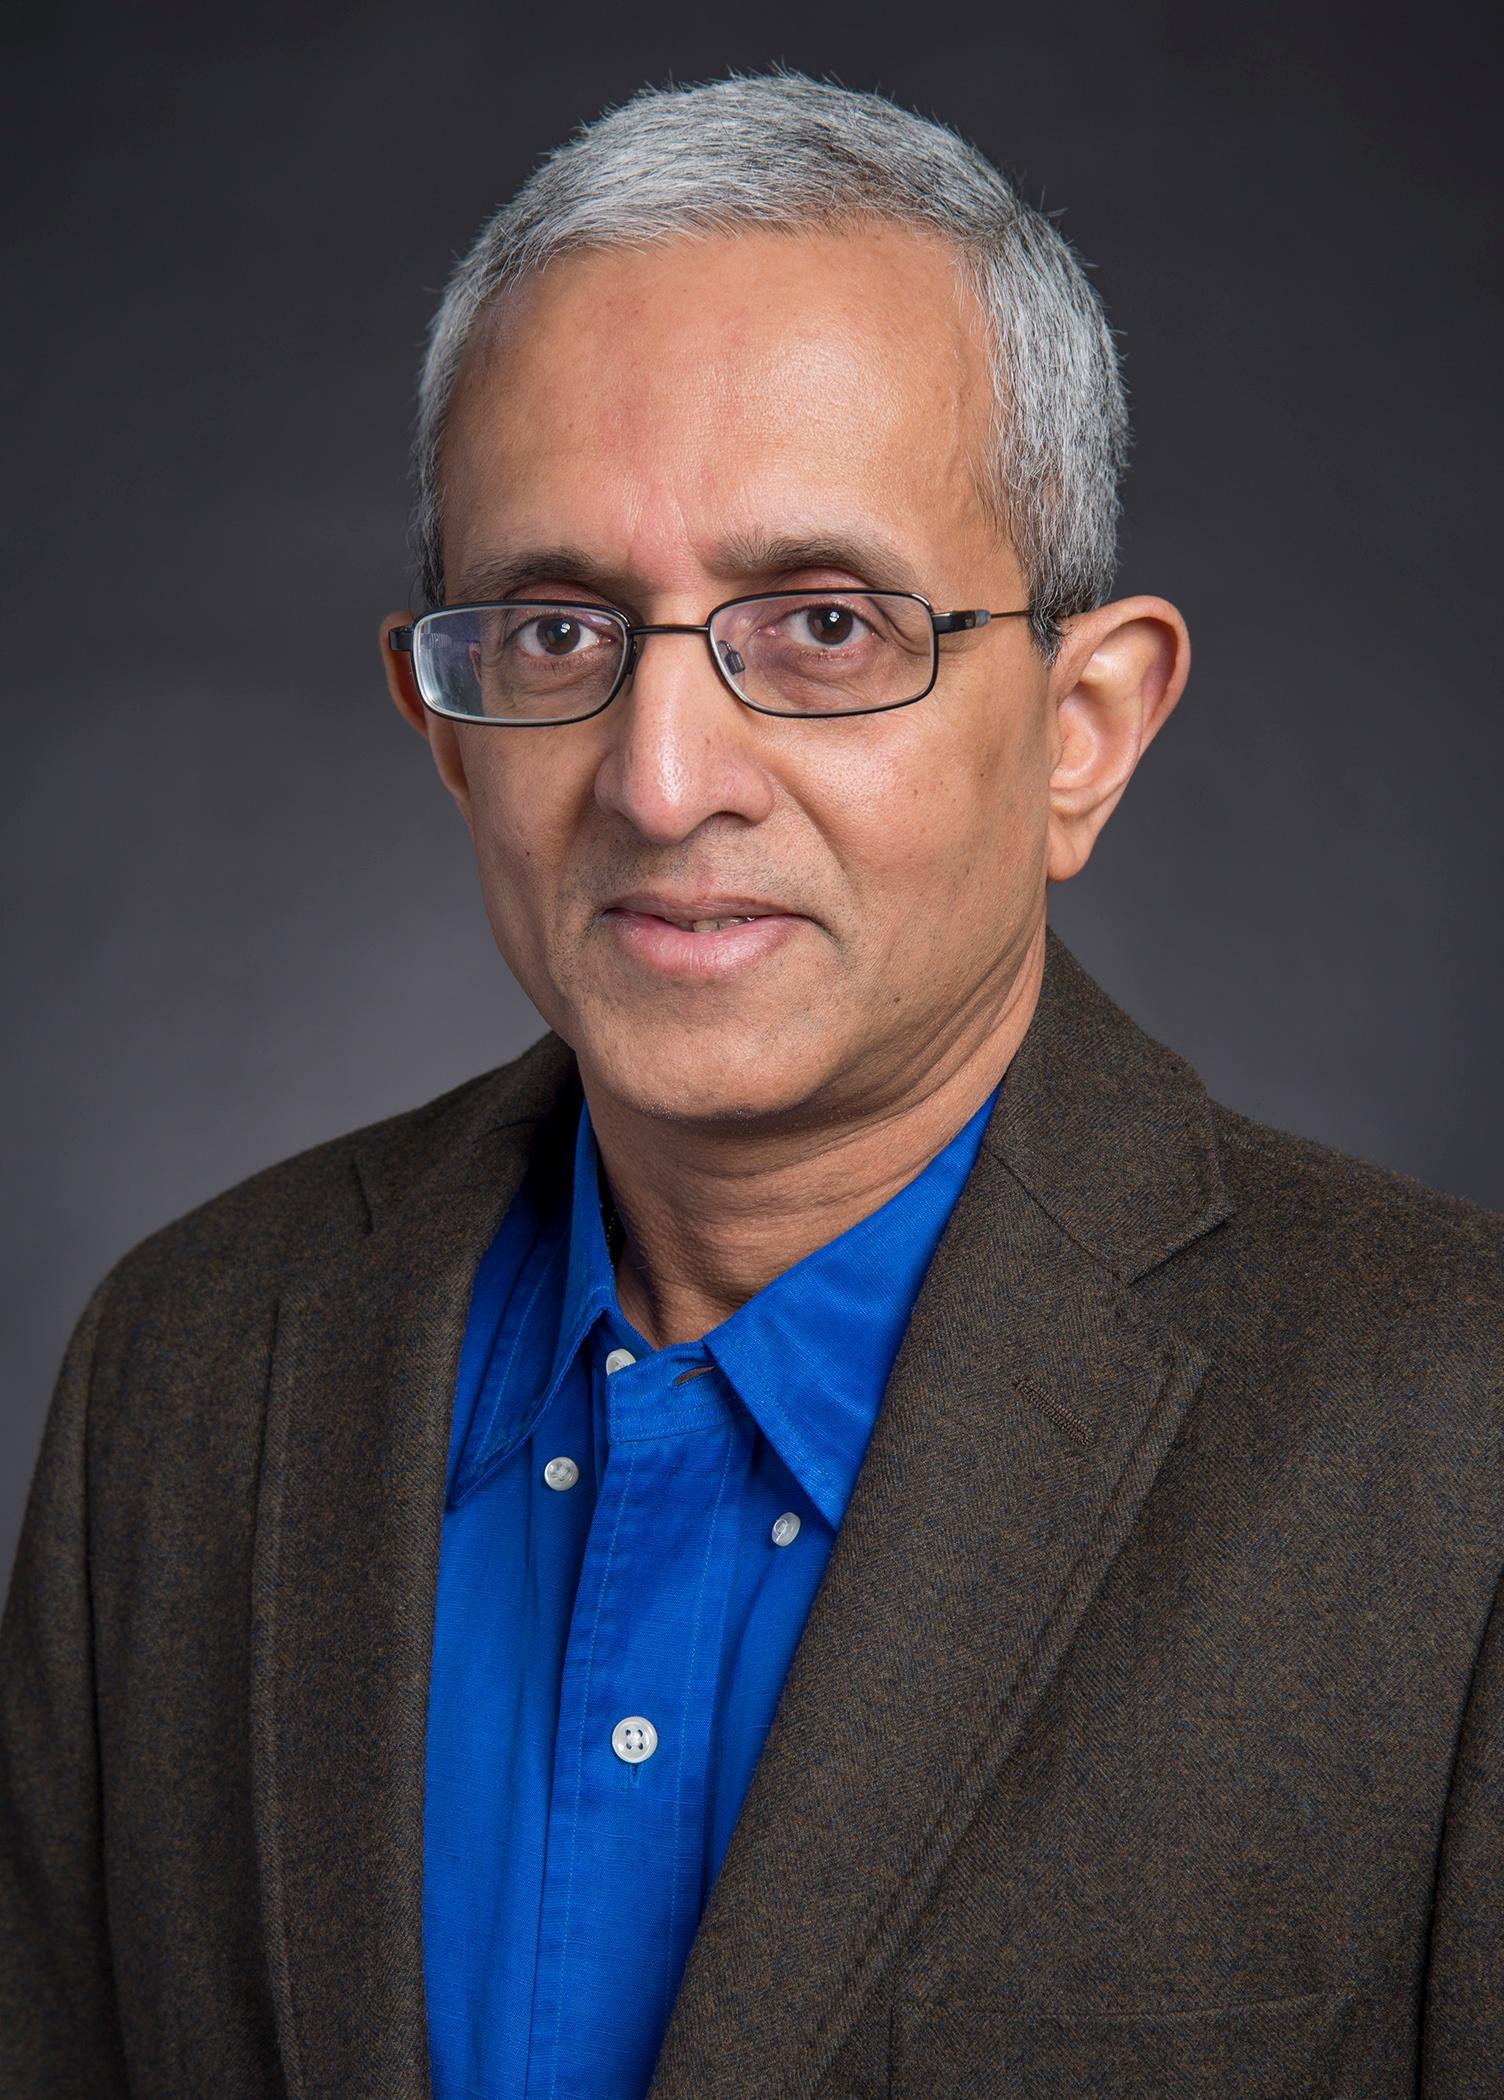 Dr. Mustafa Suterwala